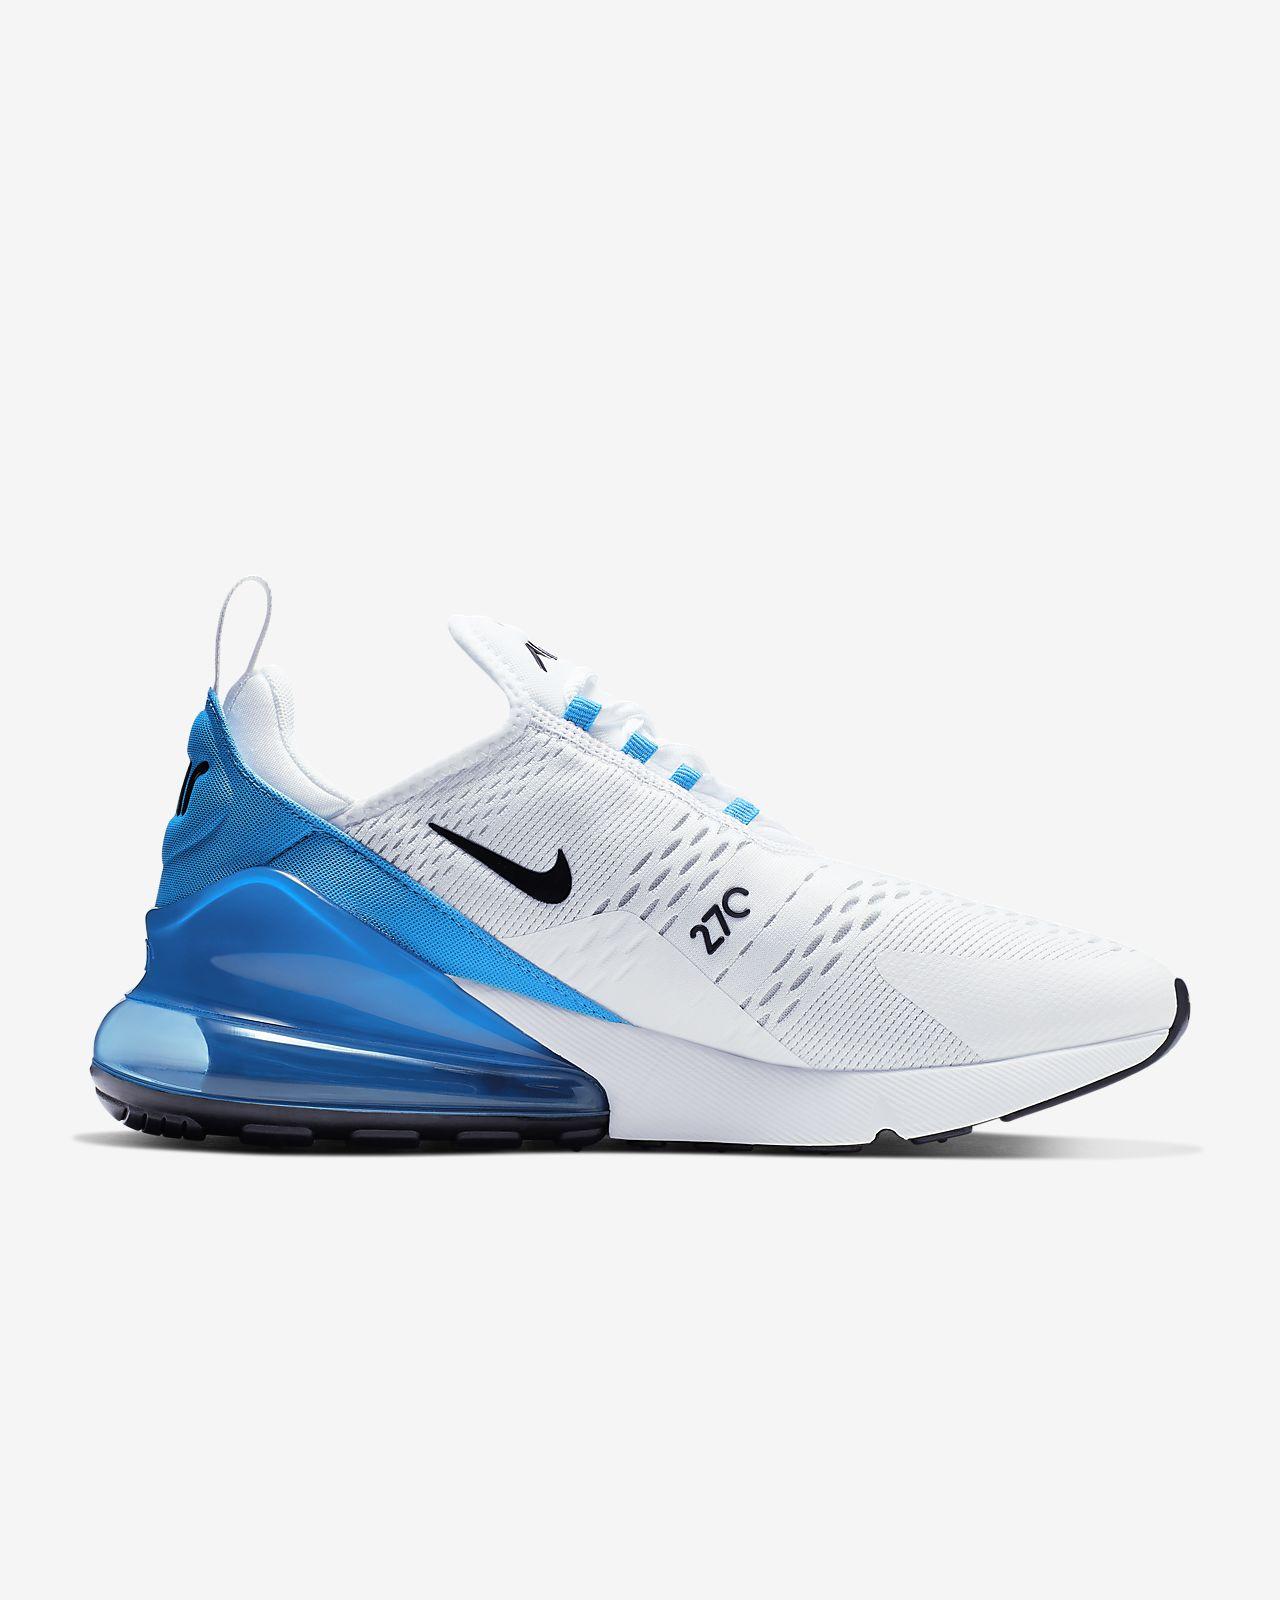 0b09c273cb ... Chaussure Nike Air Max 270 pour Homme. FR · Officiel Nike Air Max 270  Gaz Chaussure Nike Running Prix Pour Homme ...